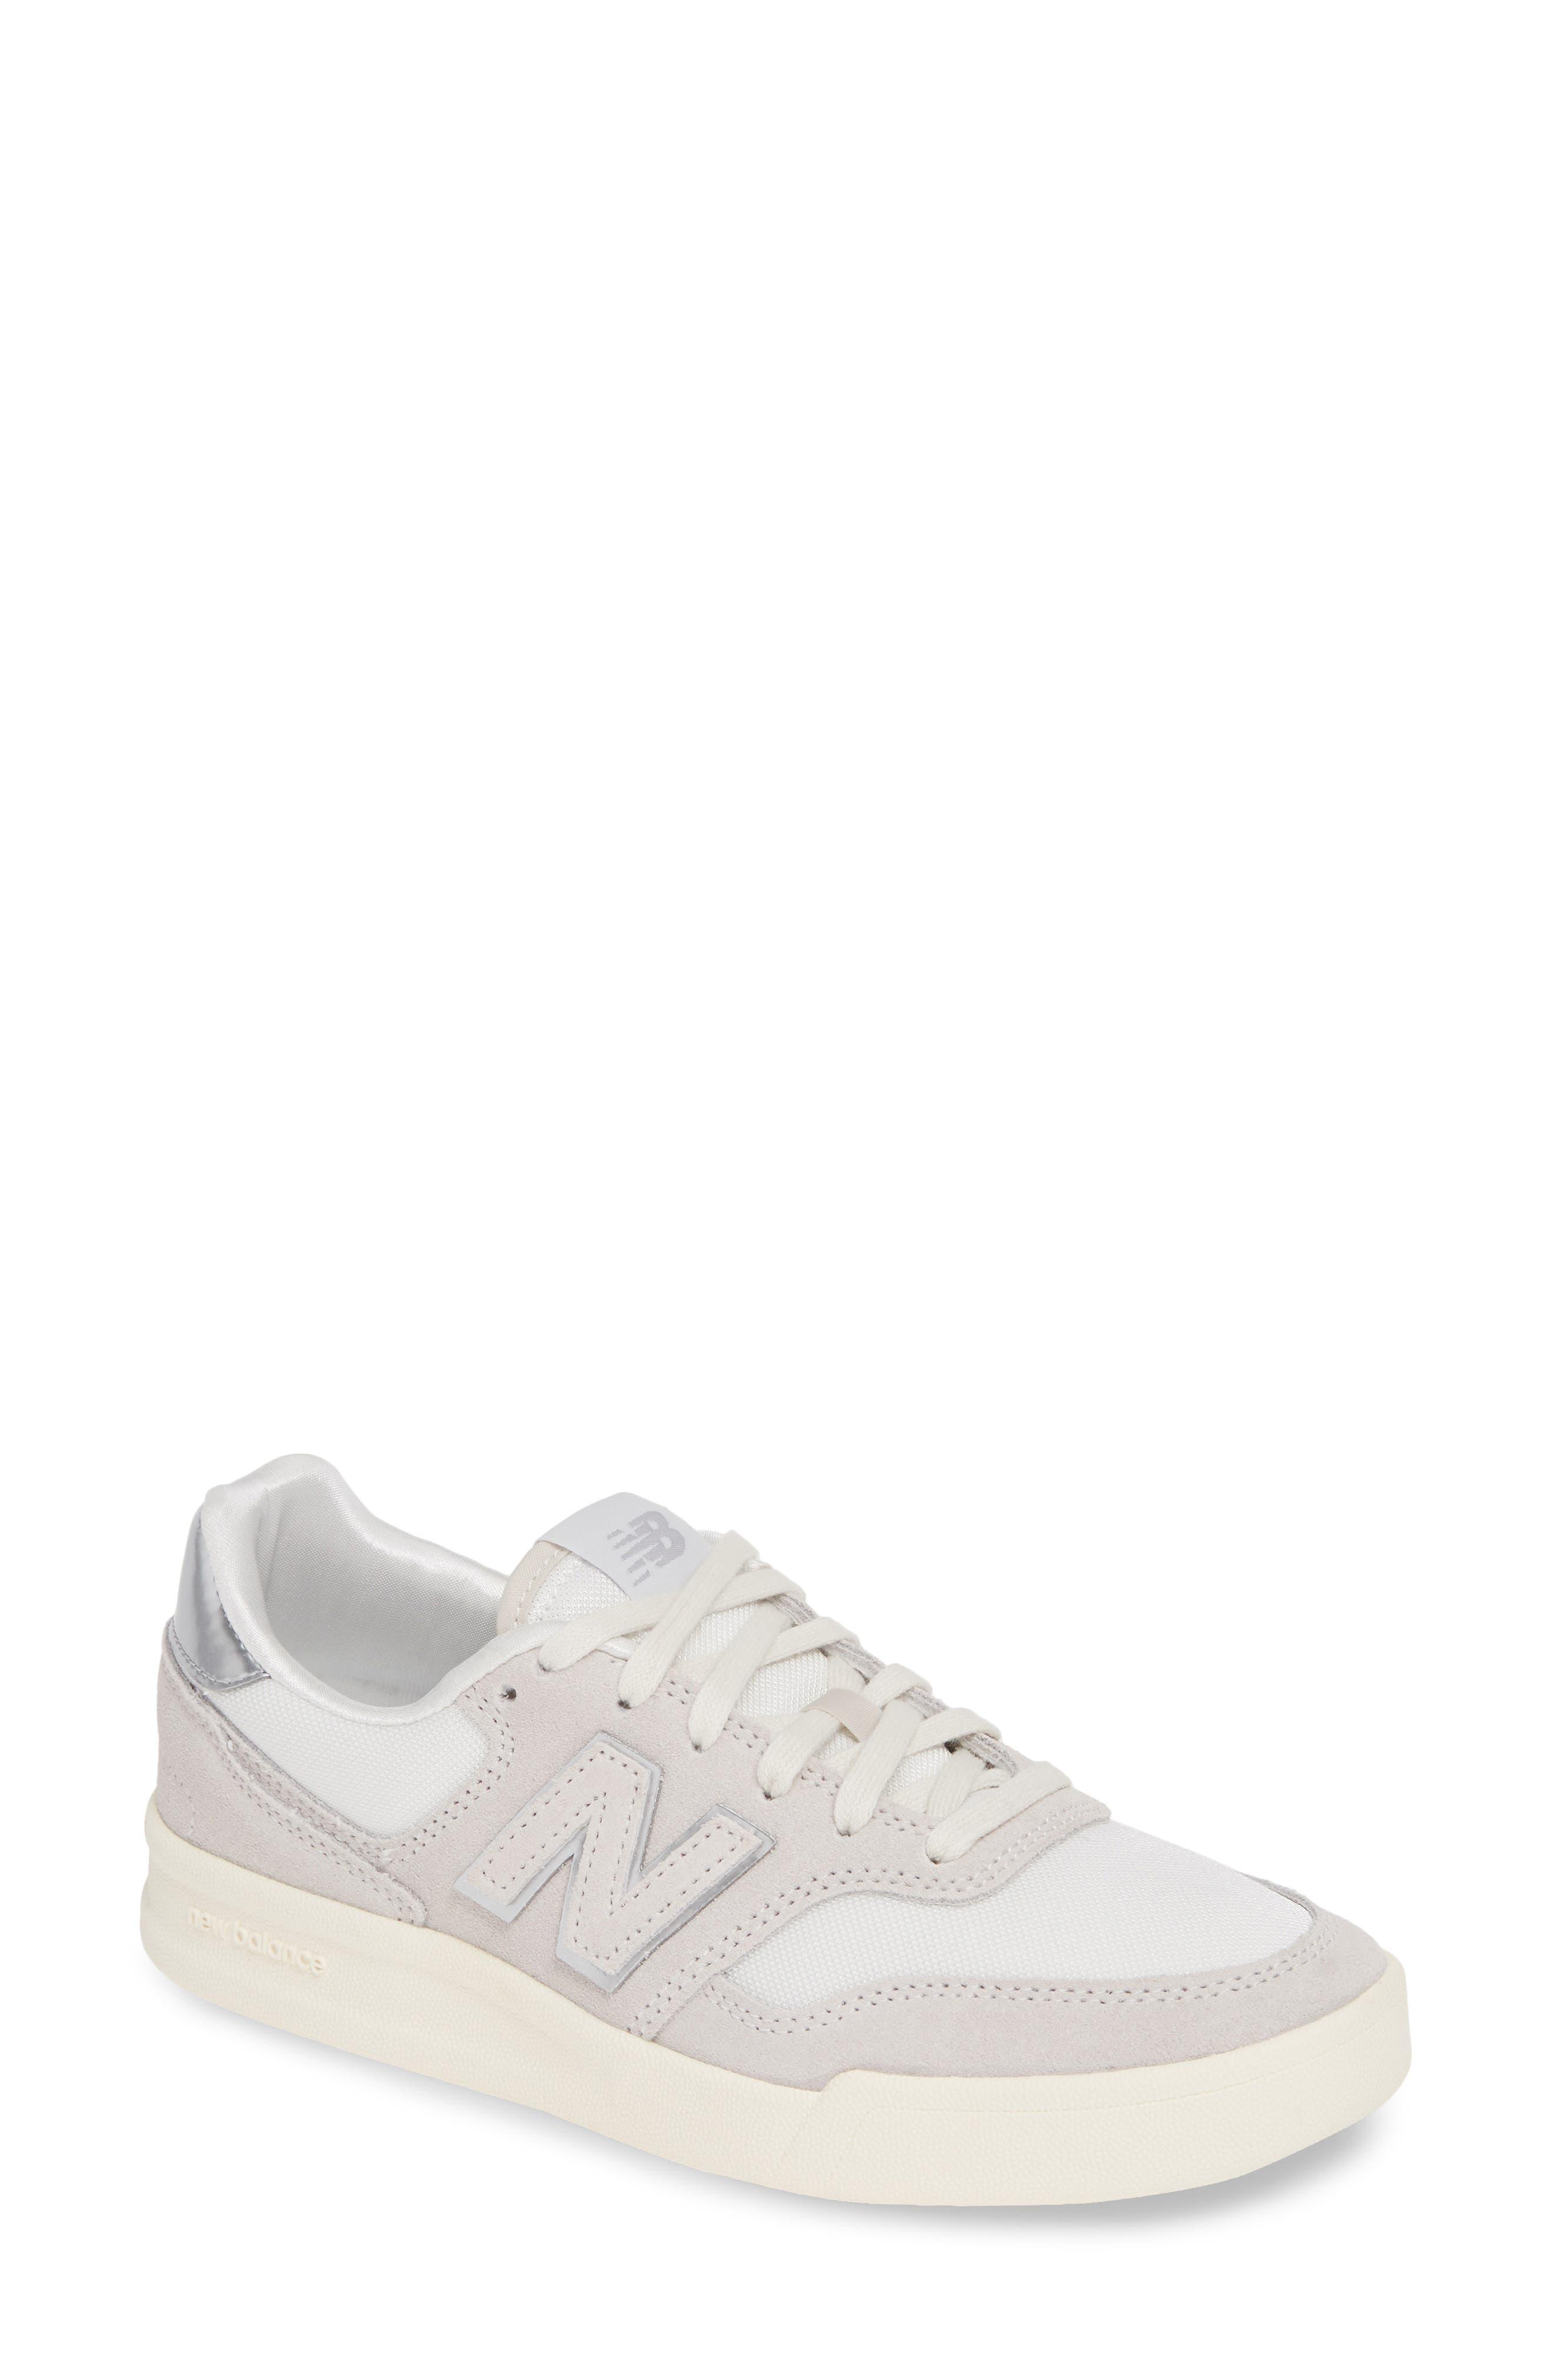 New Balance 300 Sneaker B - Grey